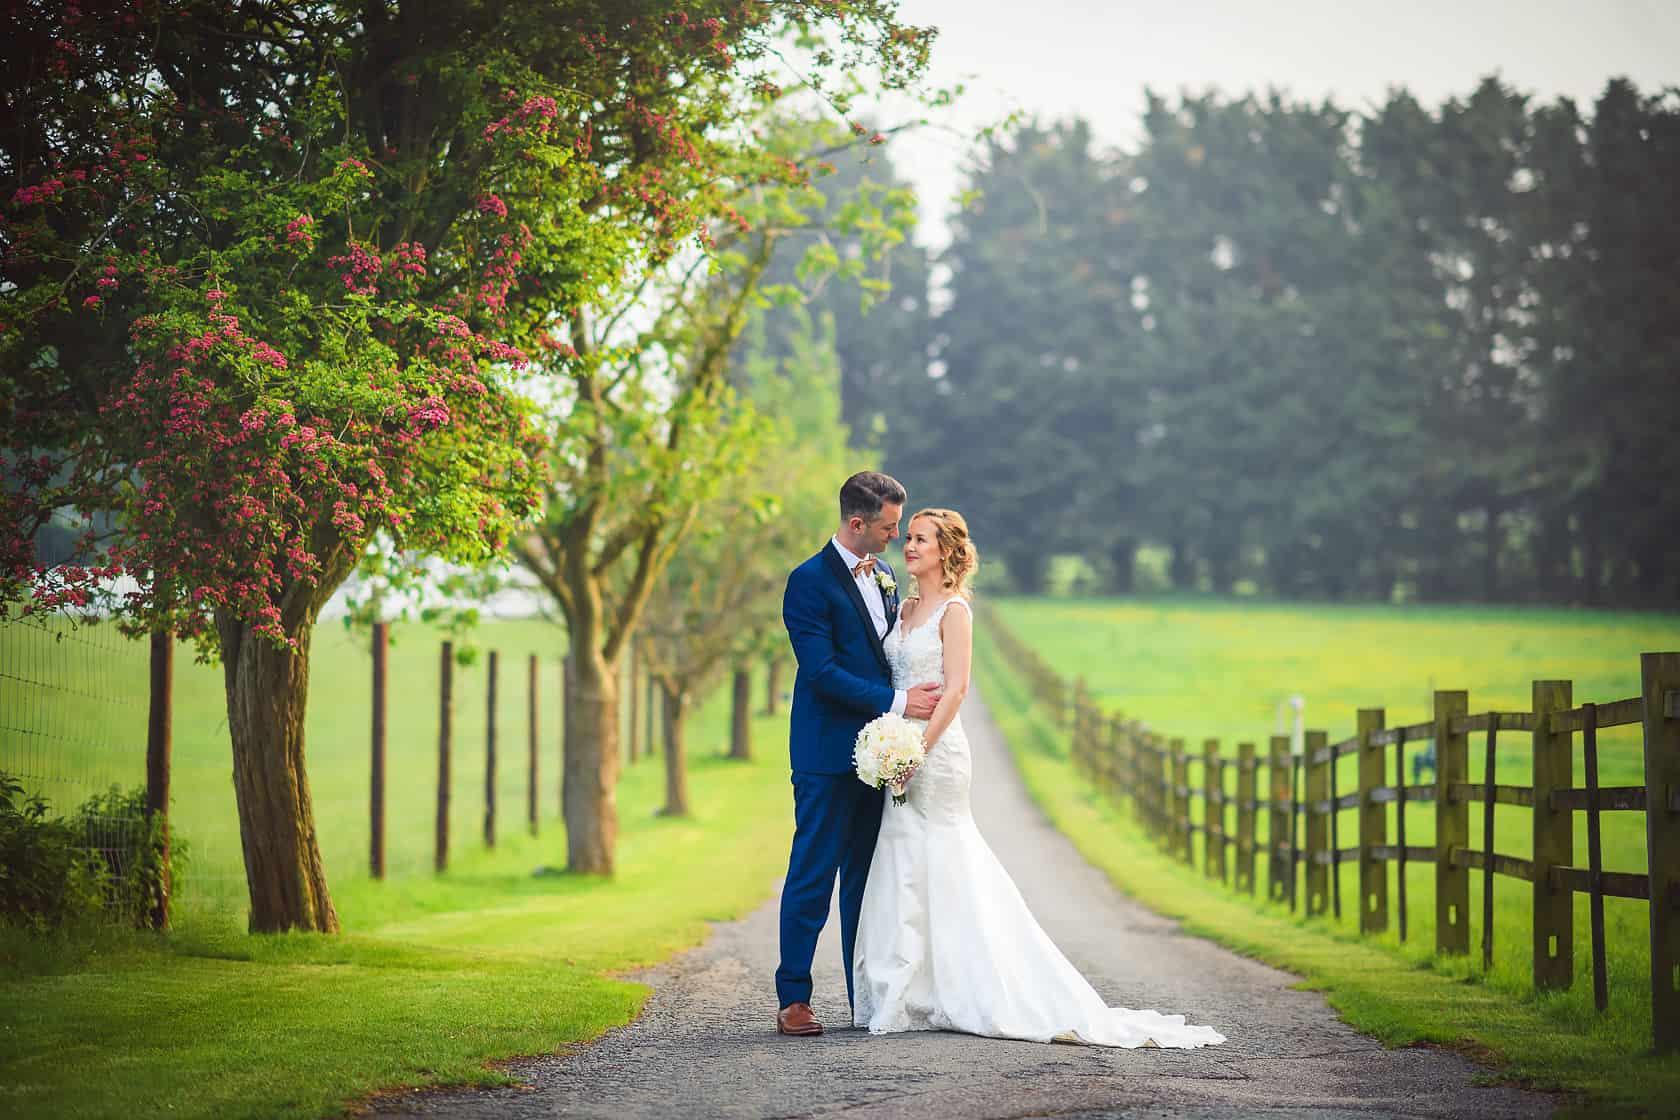 Best_Wedding_Photography_2018_Wedding-Photographer-Essex-and-London_037